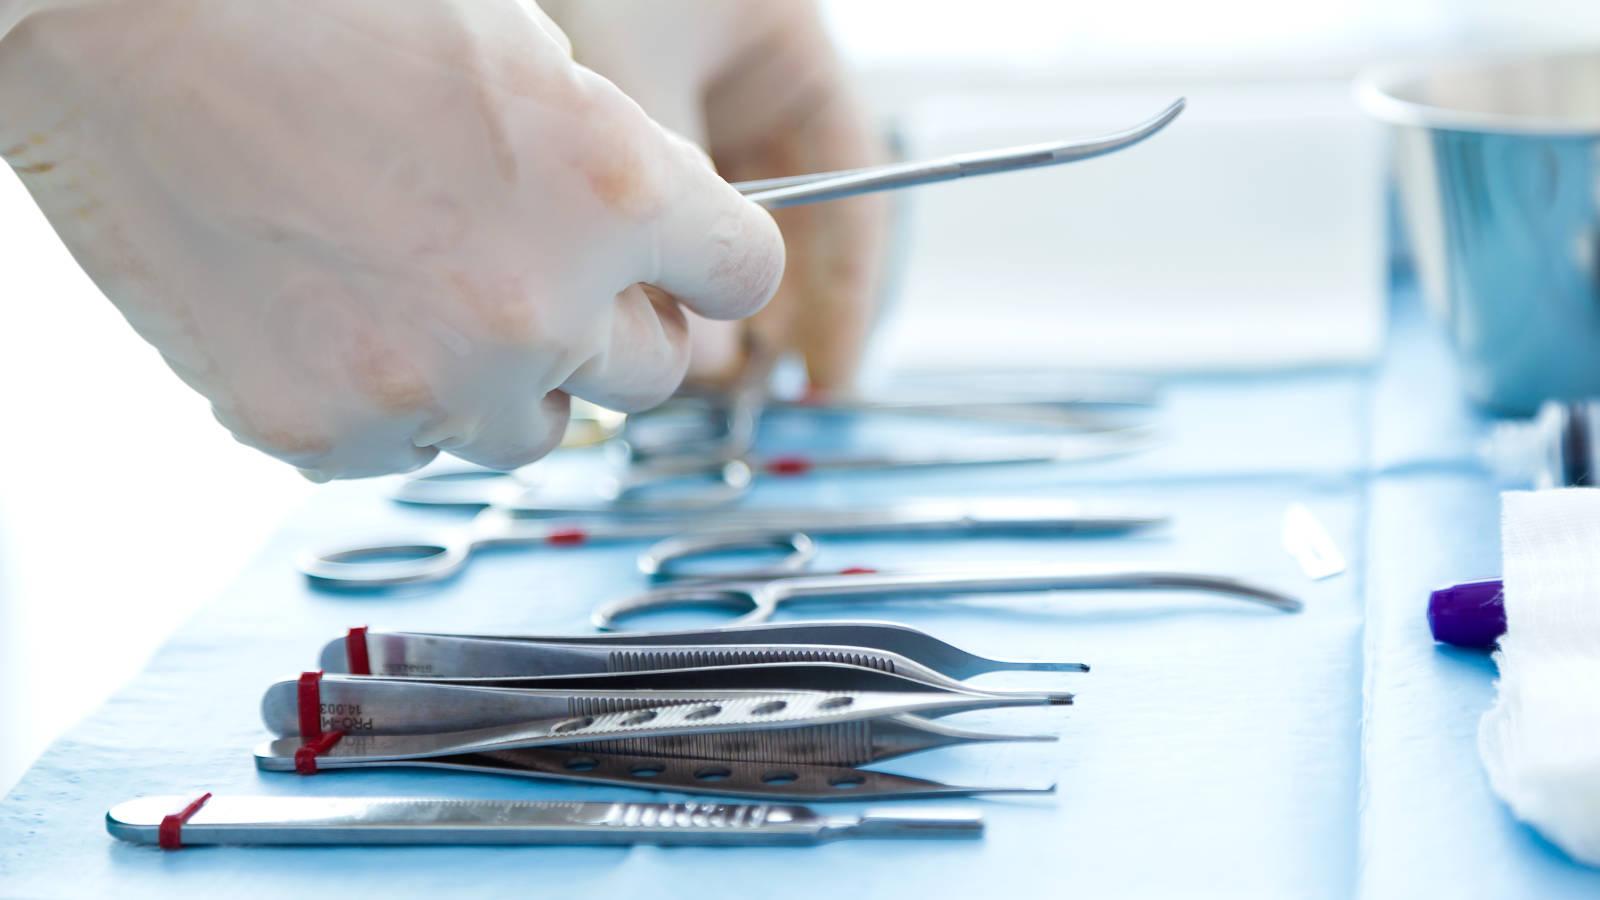 Material de consumo médico hospitalar